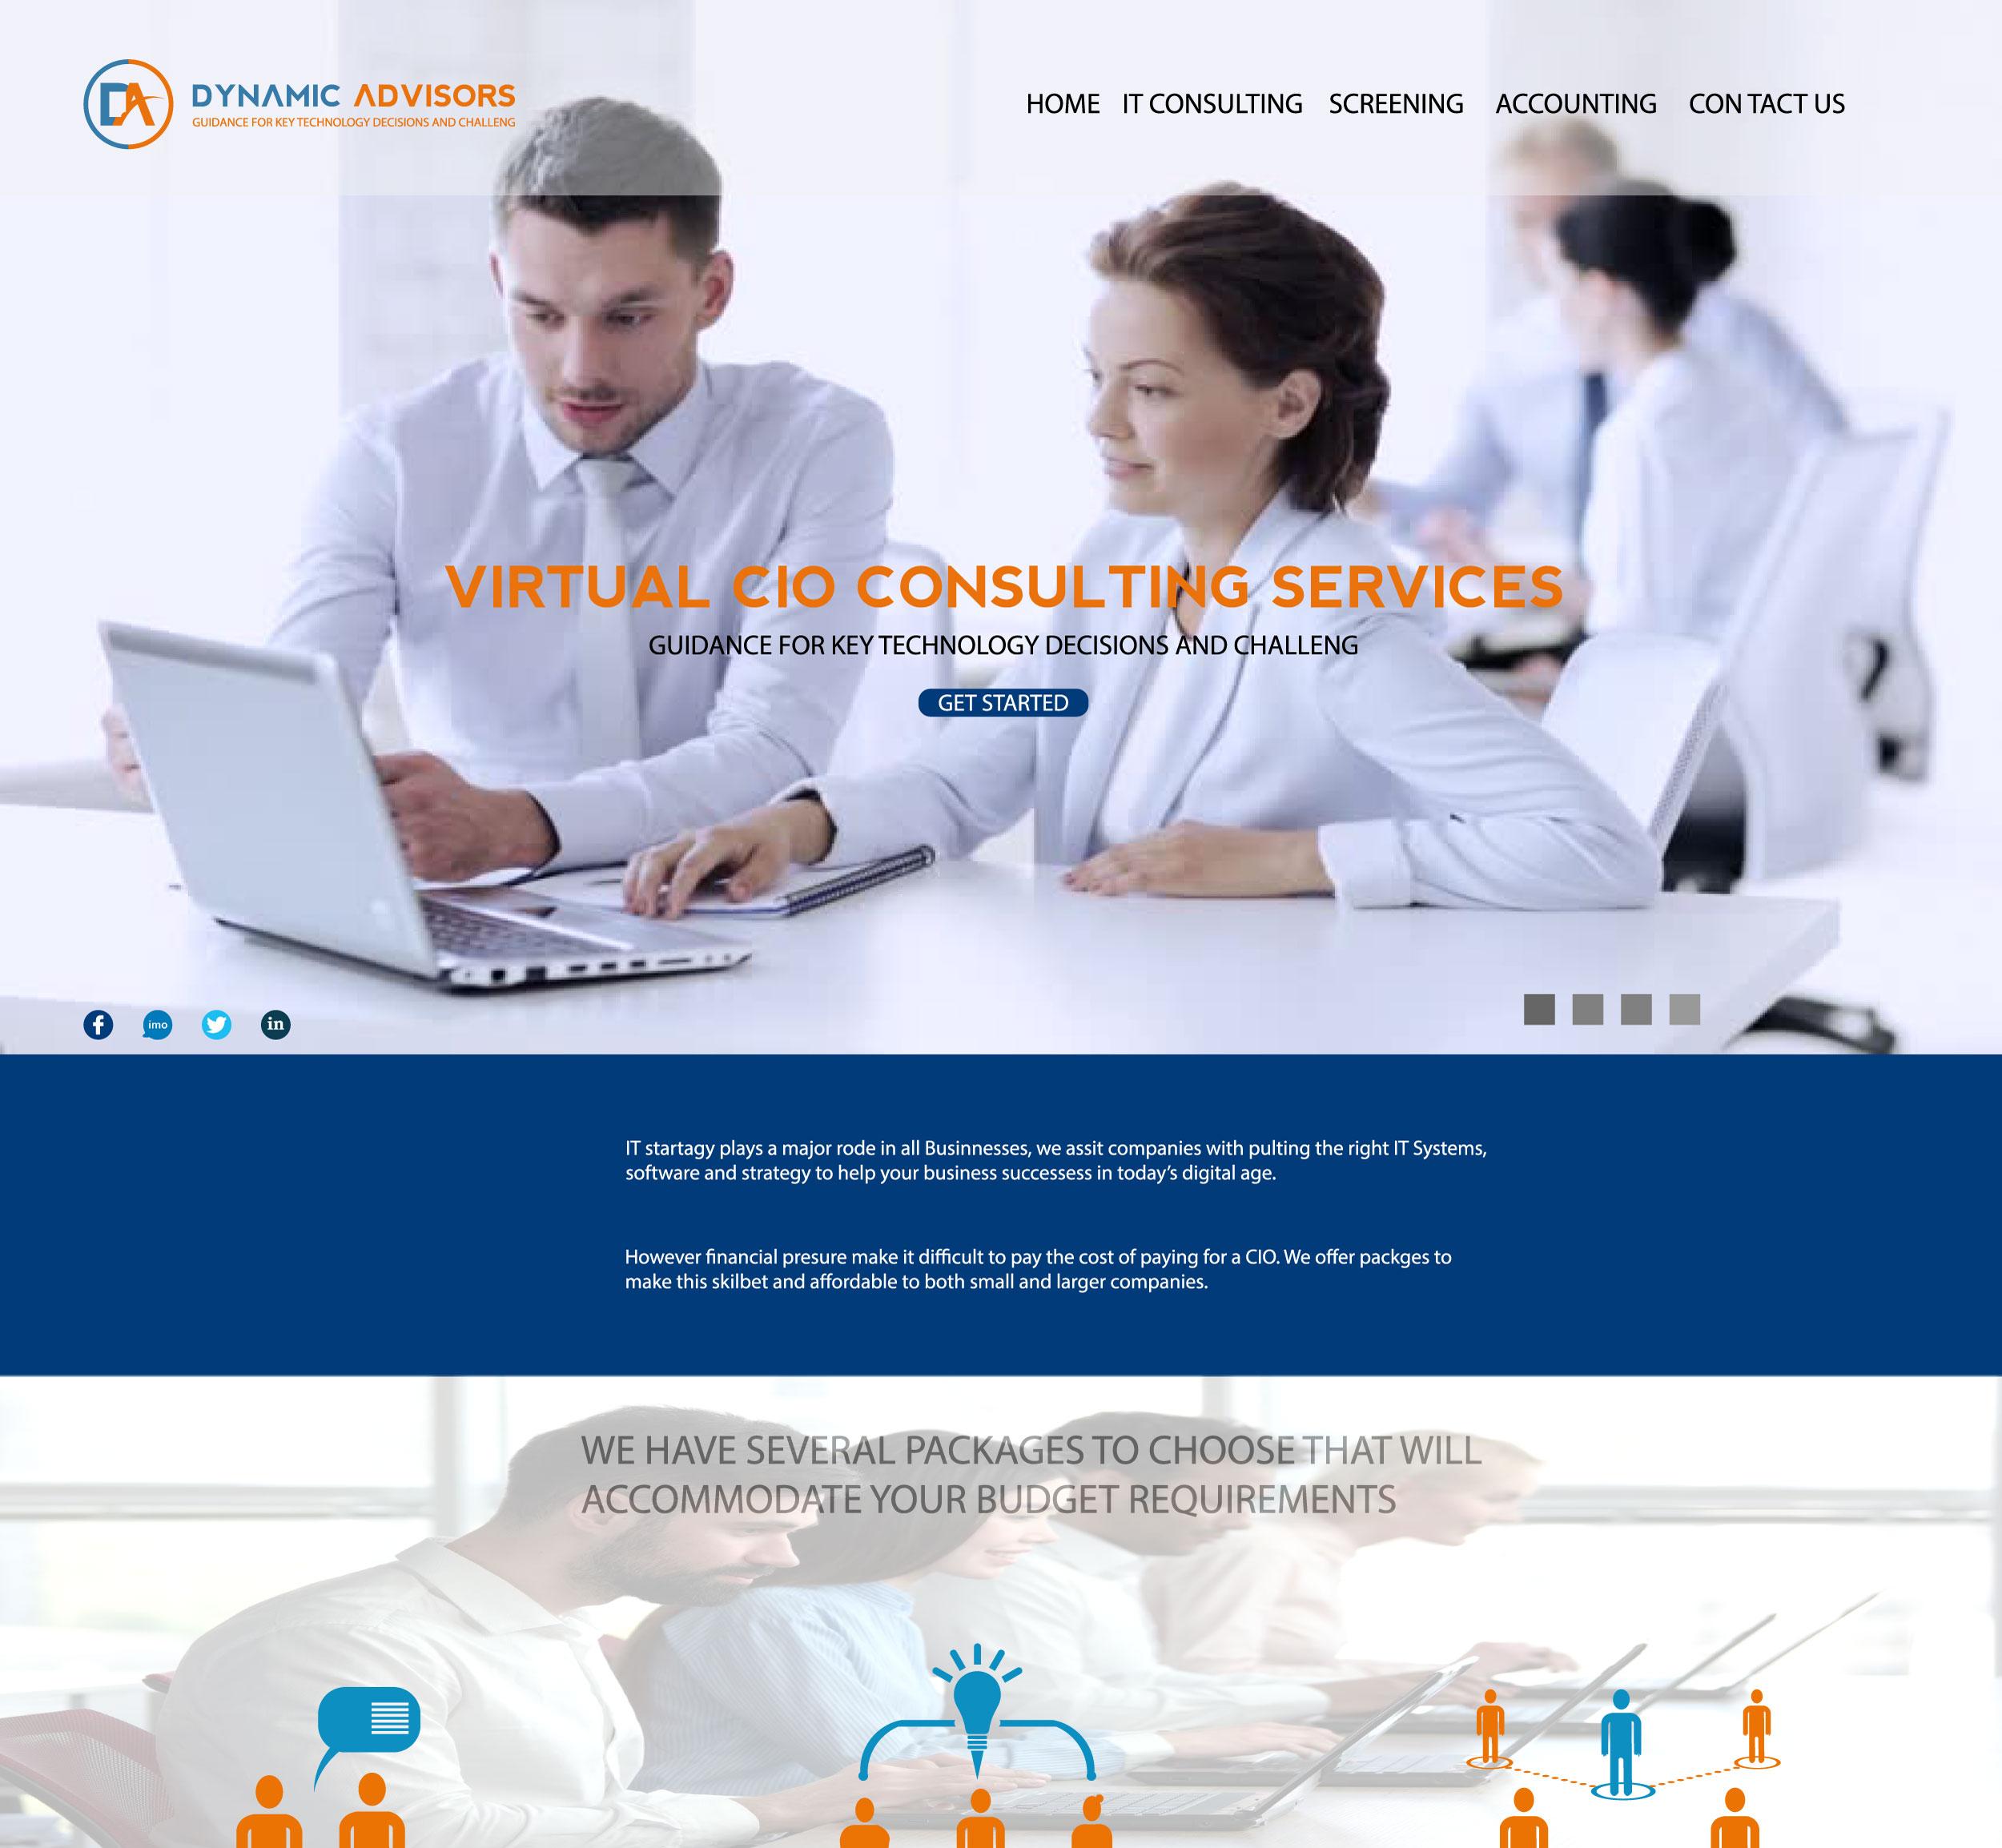 Dynami miadvisors web page design